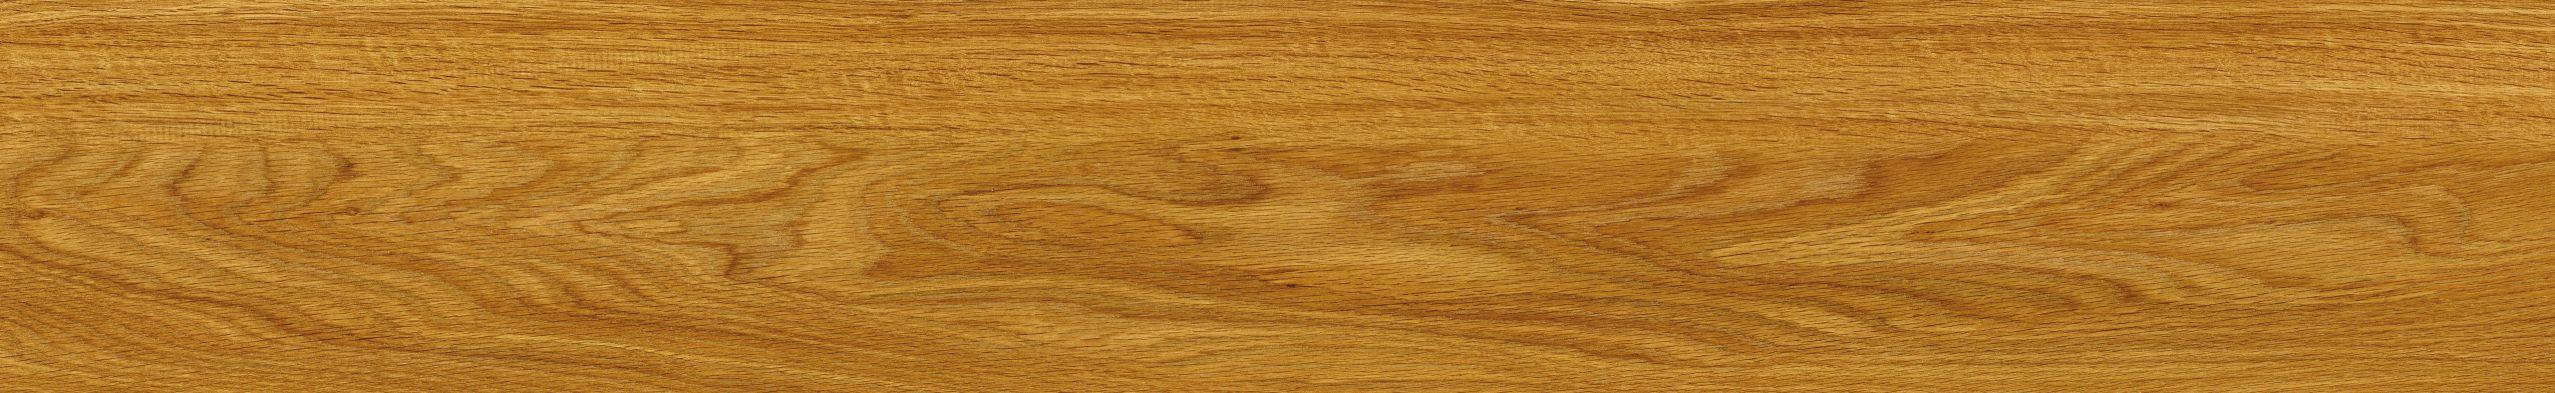 Panele winylowe LVT modulari ® WOOD DRYBACK 19,6 x 132 cm 24256